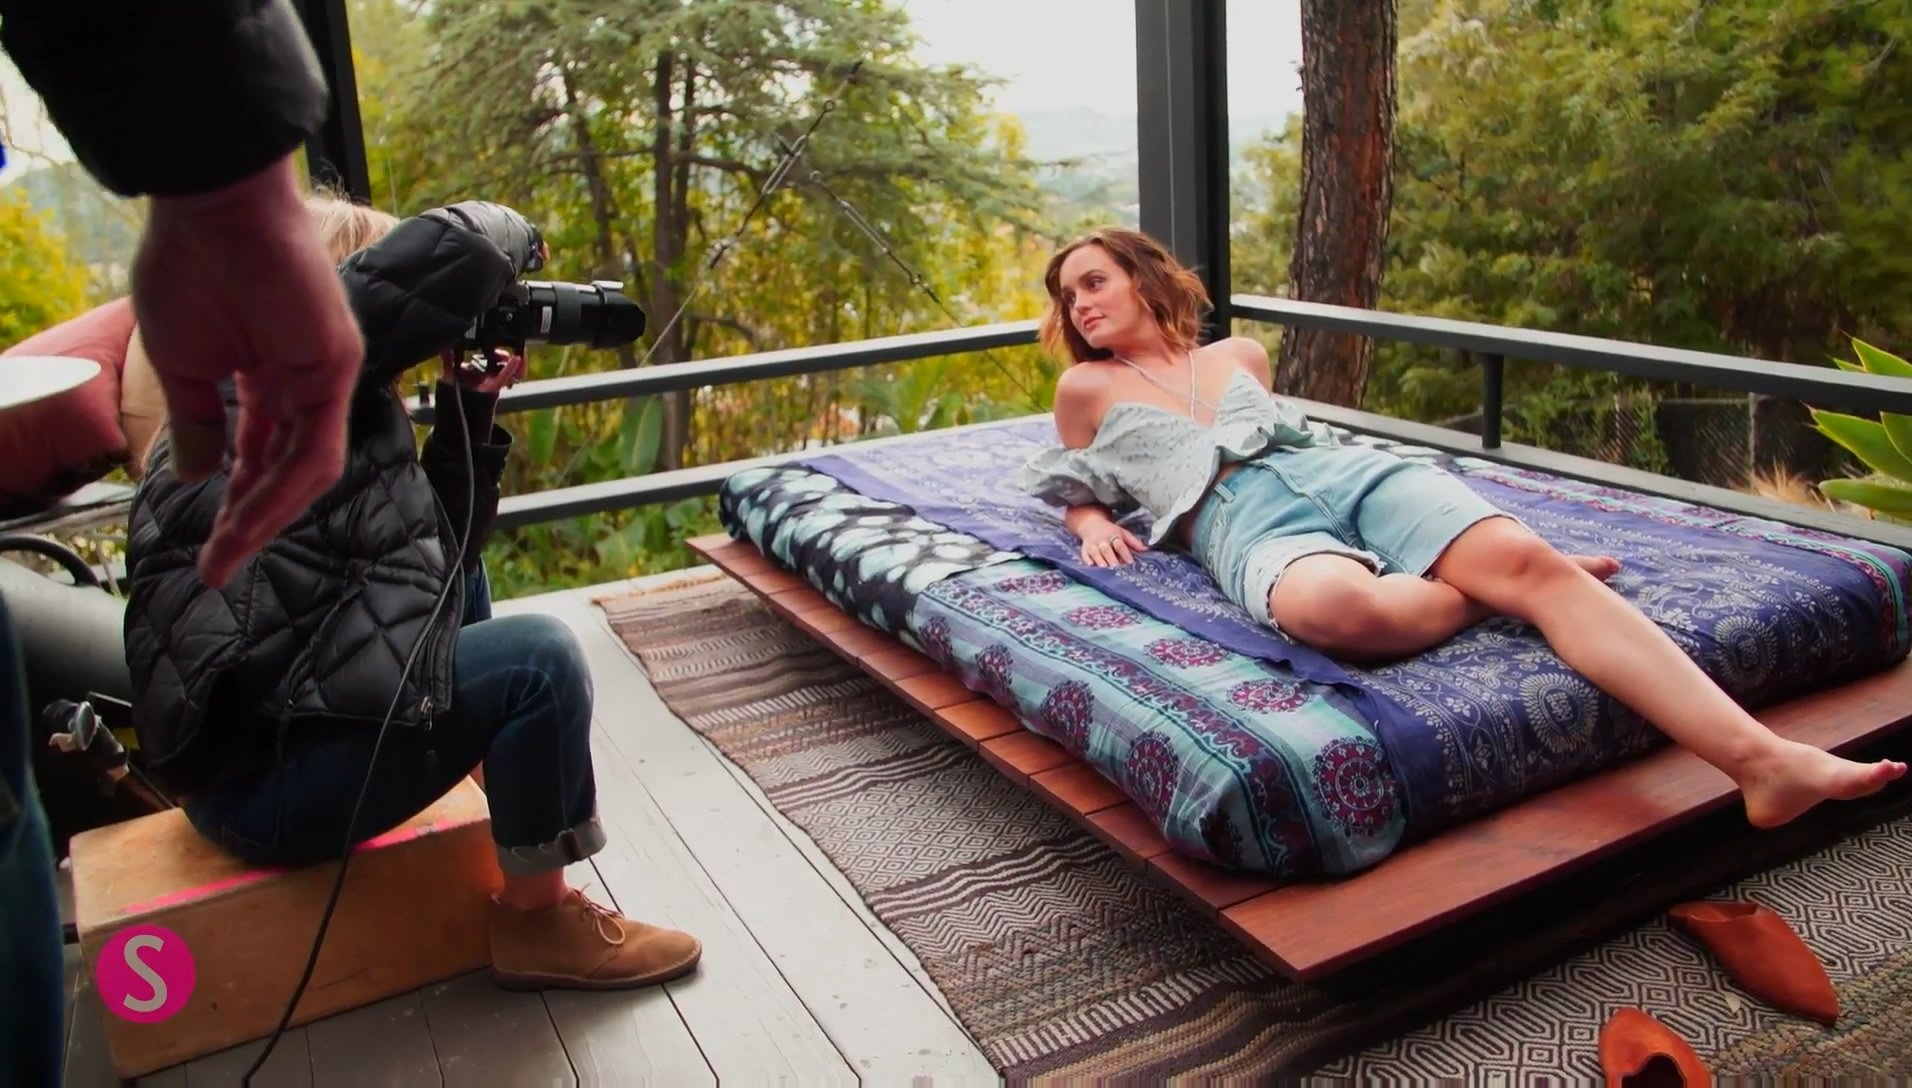 Leighton Meester Sexy Photoshoot